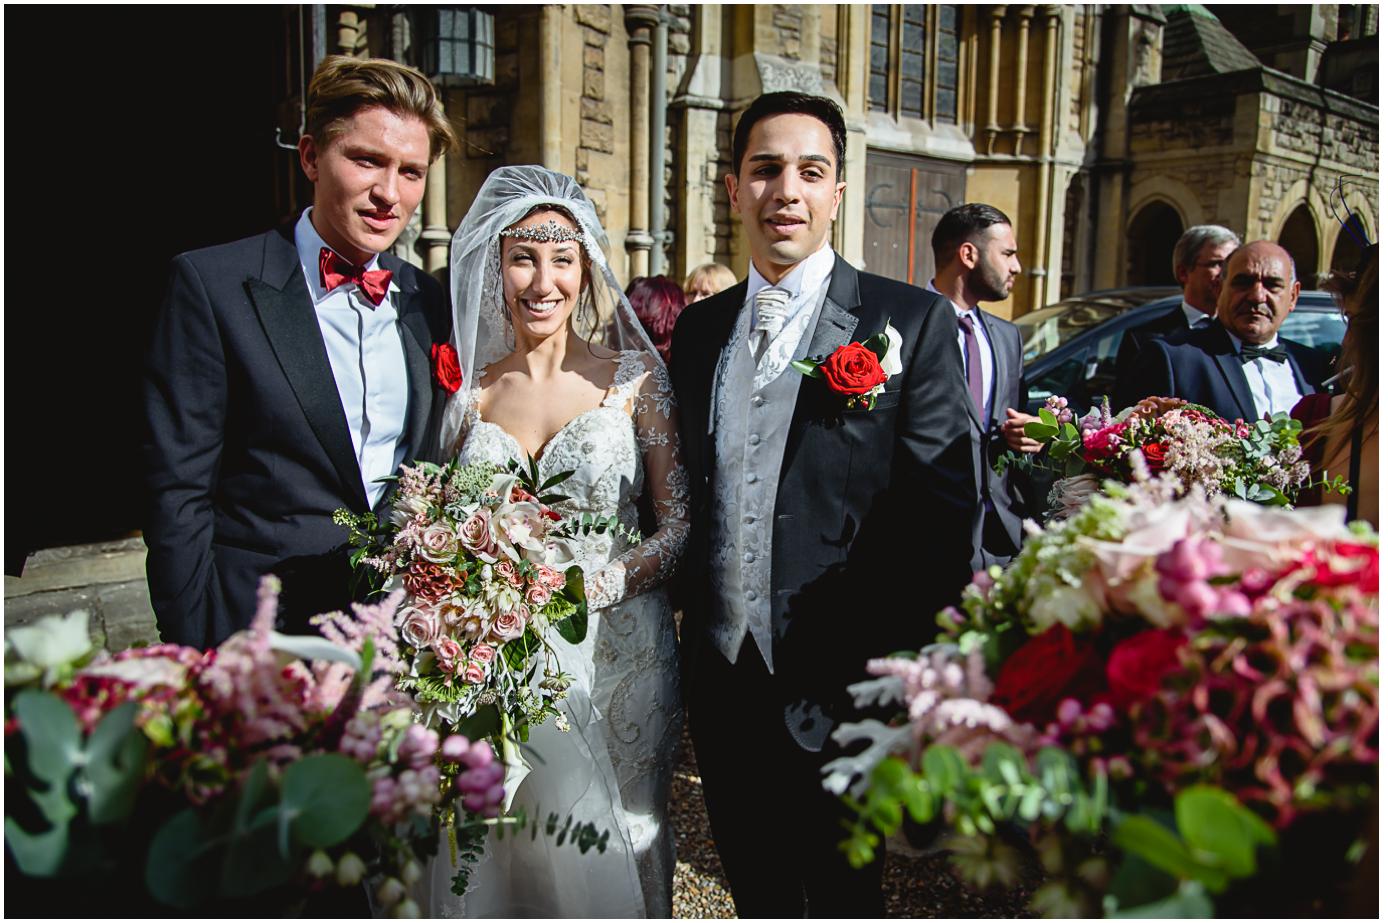 iranian wedding photographer 114 - Drapers Hall London Wedding Photographer